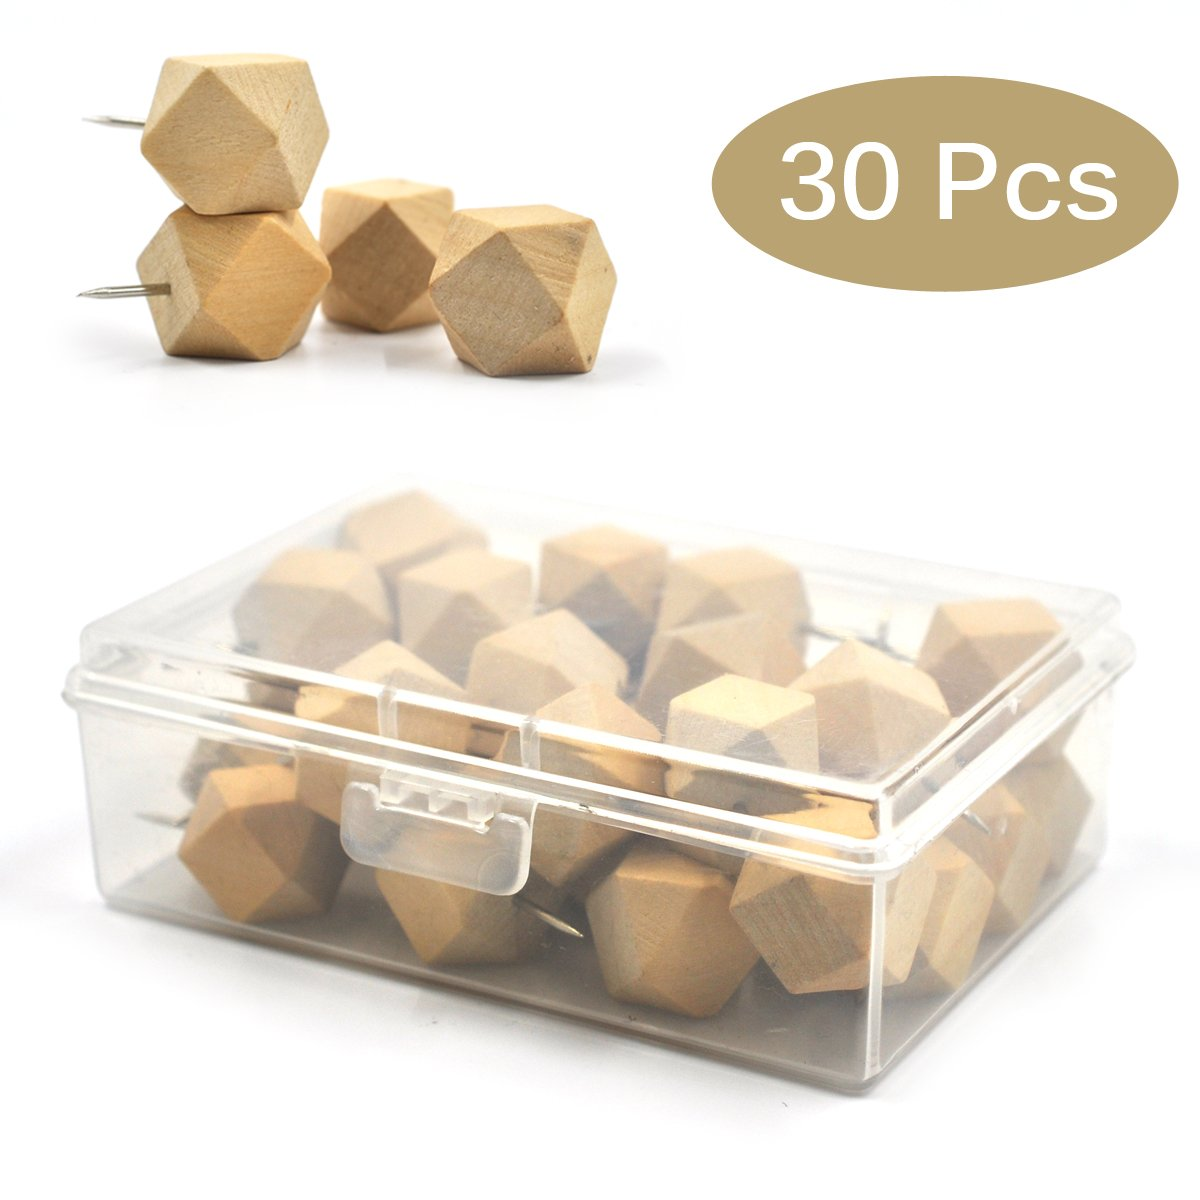 eZAKKA 30Pieces Push Pins Geometric Wood Wooden Thumb Tacks Decorative for Cork Boards Map Photos Calendar with Box